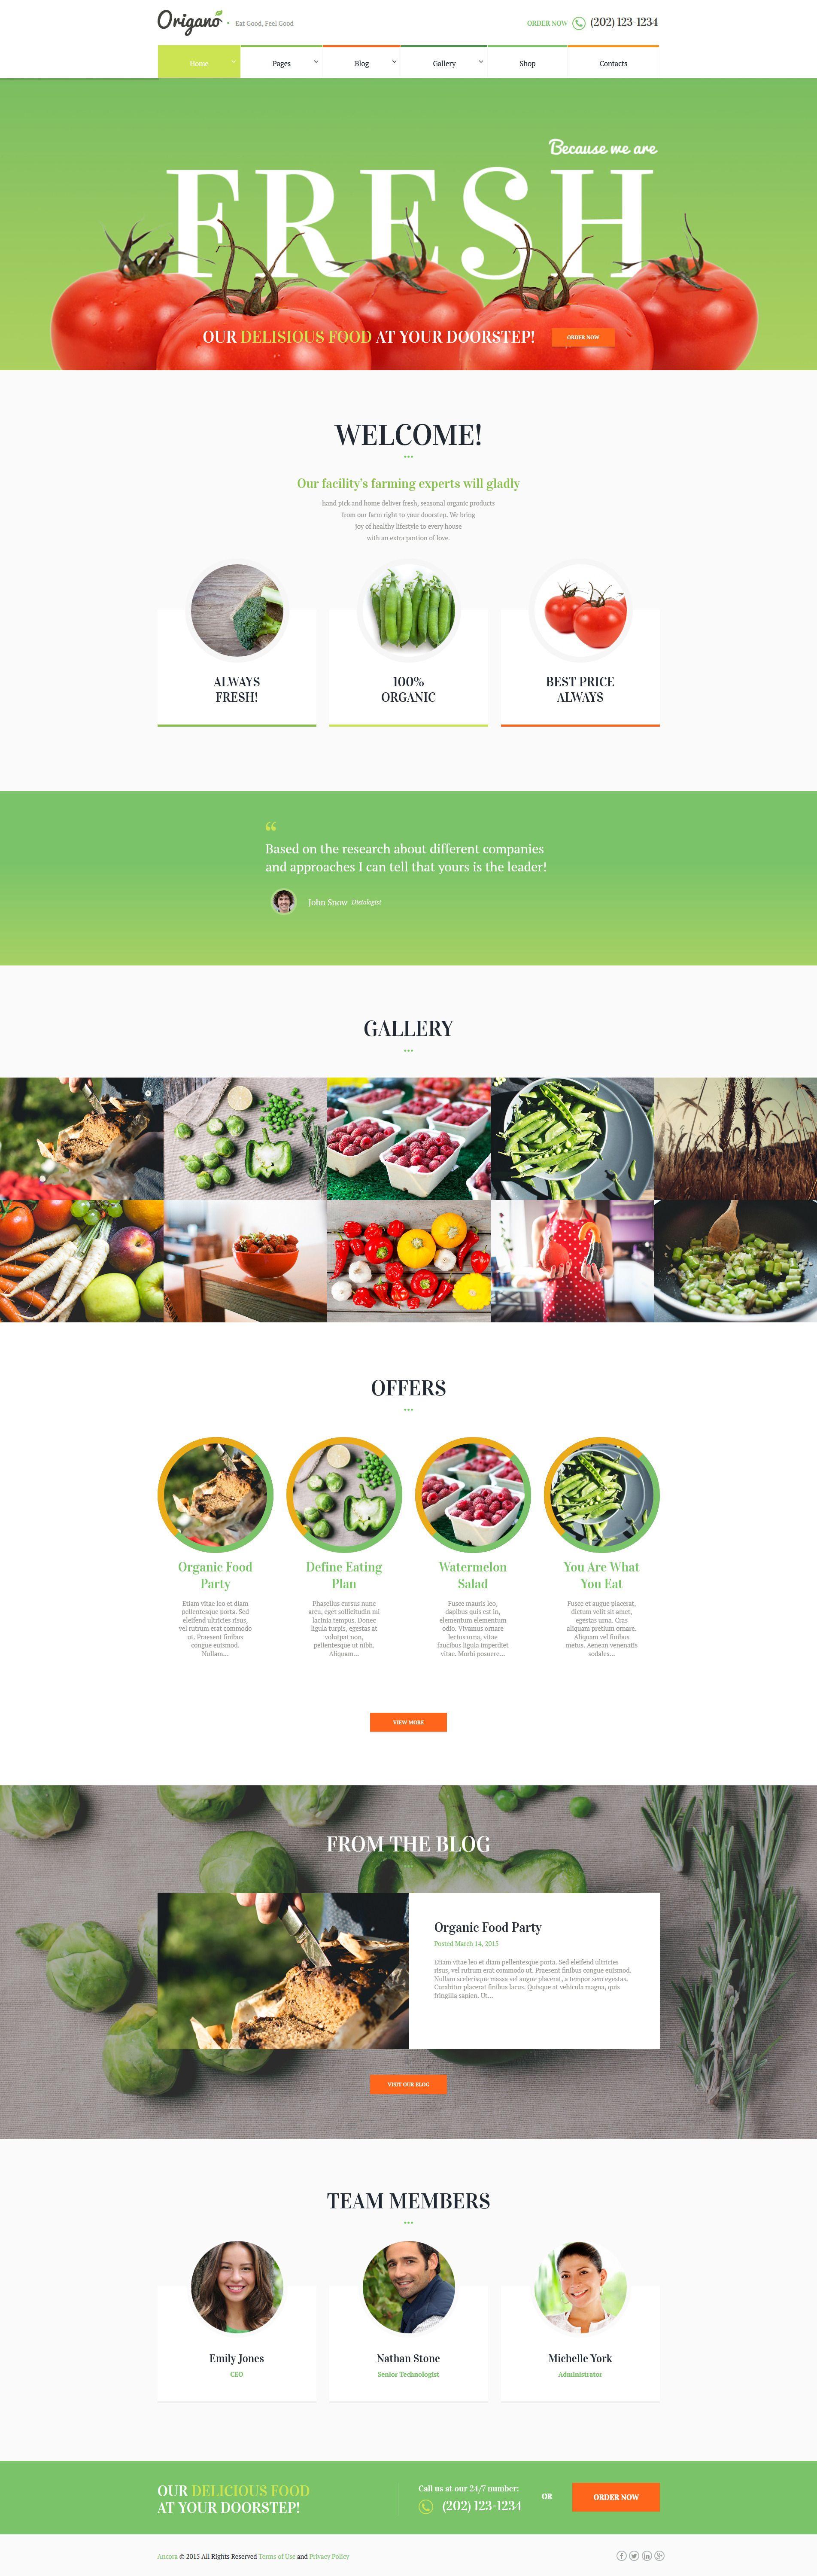 Origano - Organic Food & Eco Farm Theme #WordPress